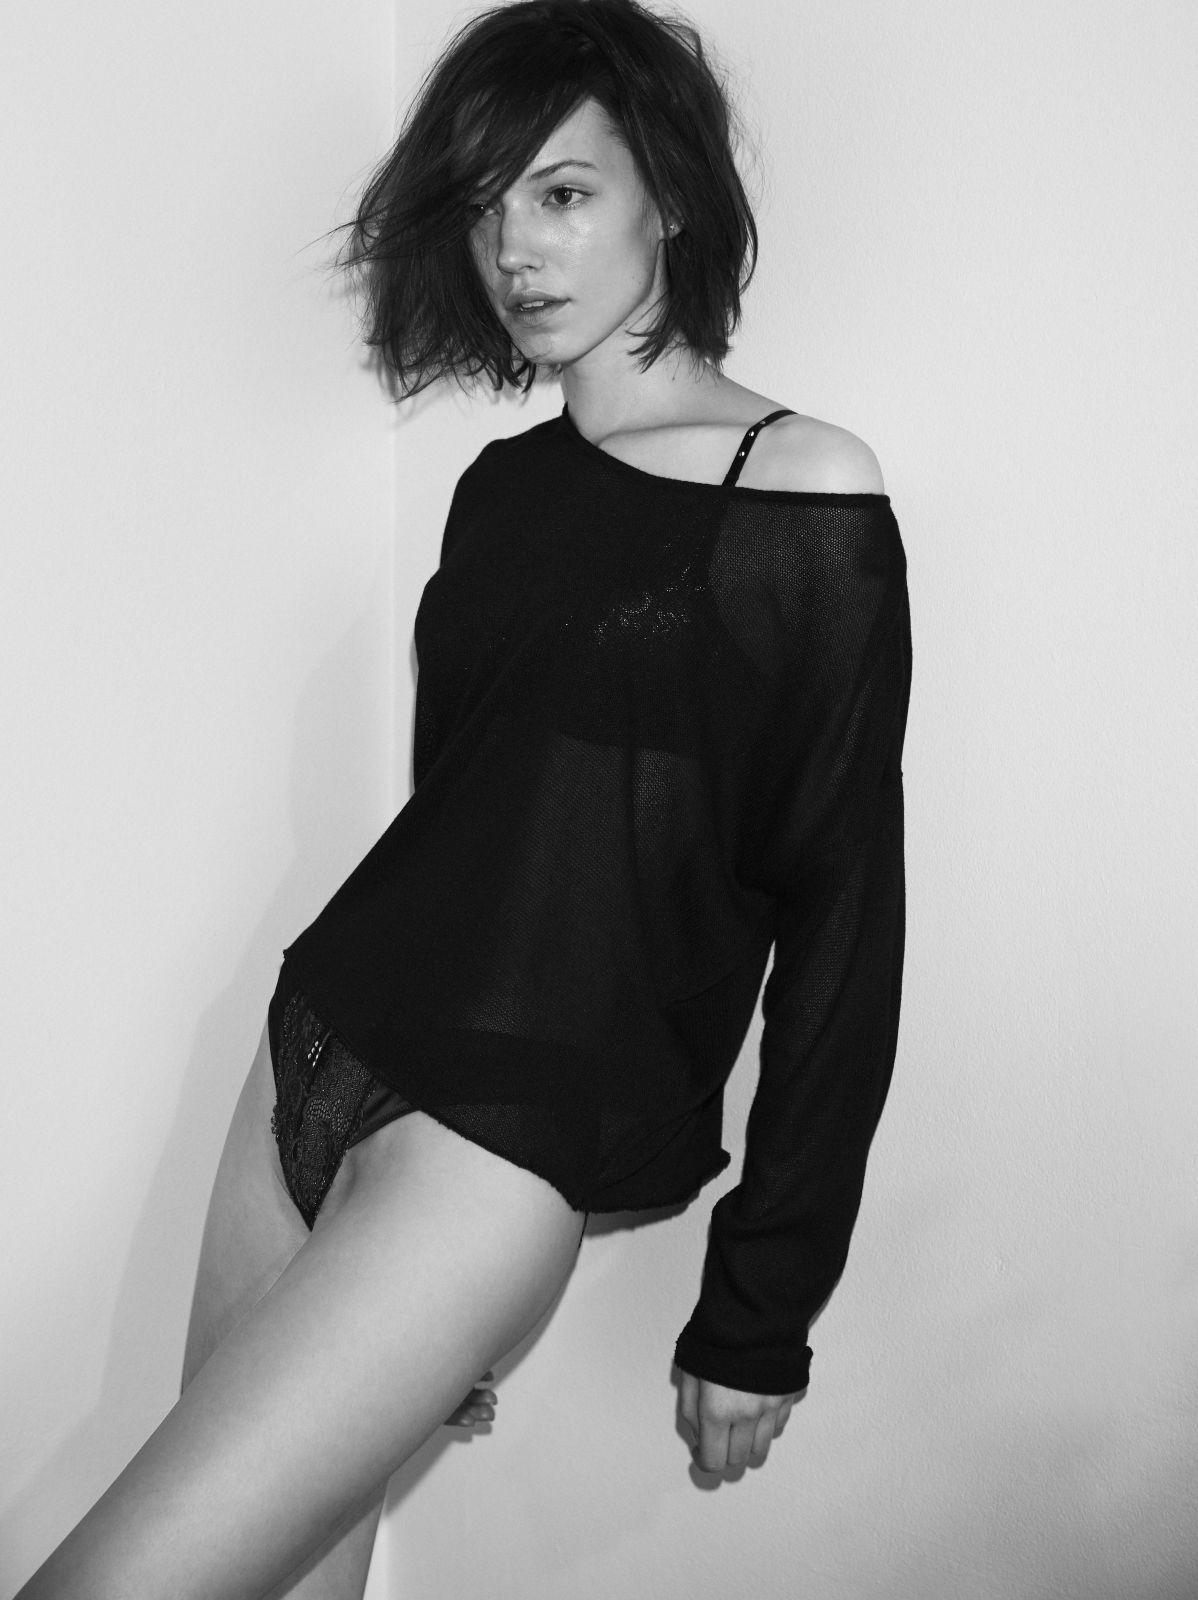 Young Corrie Lejuwaan nudes (96 photo), Tits, Hot, Selfie, braless 2018